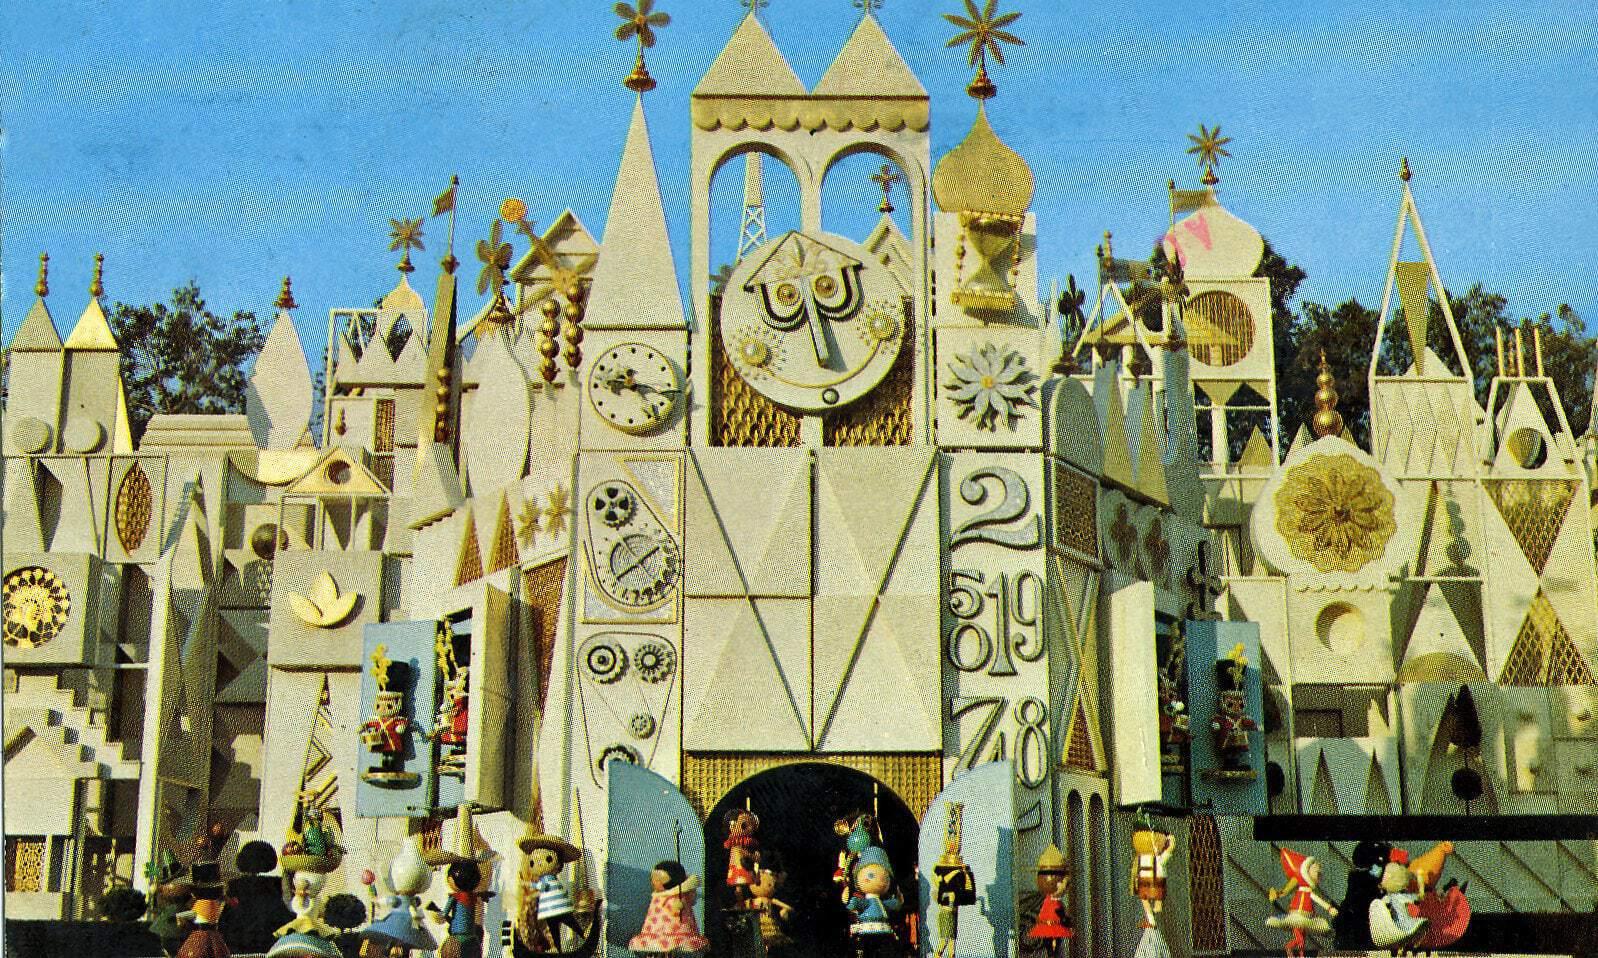 Disneyland Small World facade vintage postcard